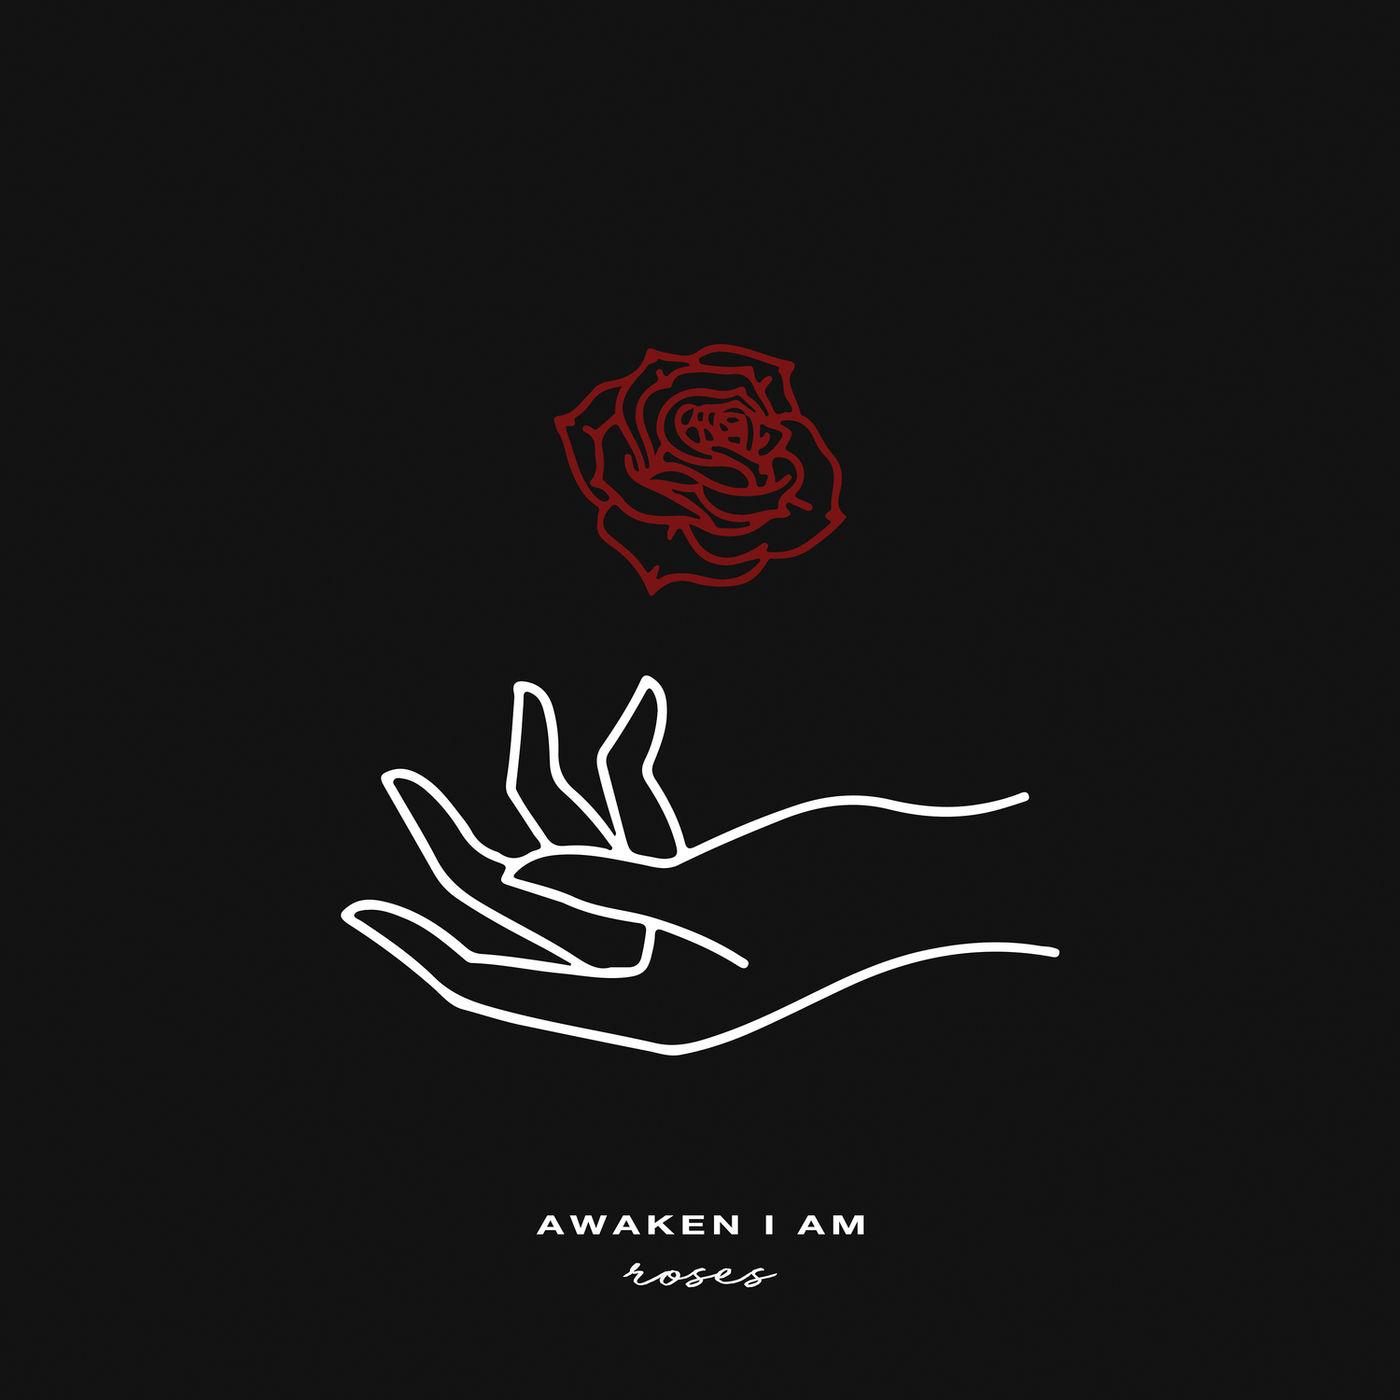 Awaken I Am - Roses [single] (2020)